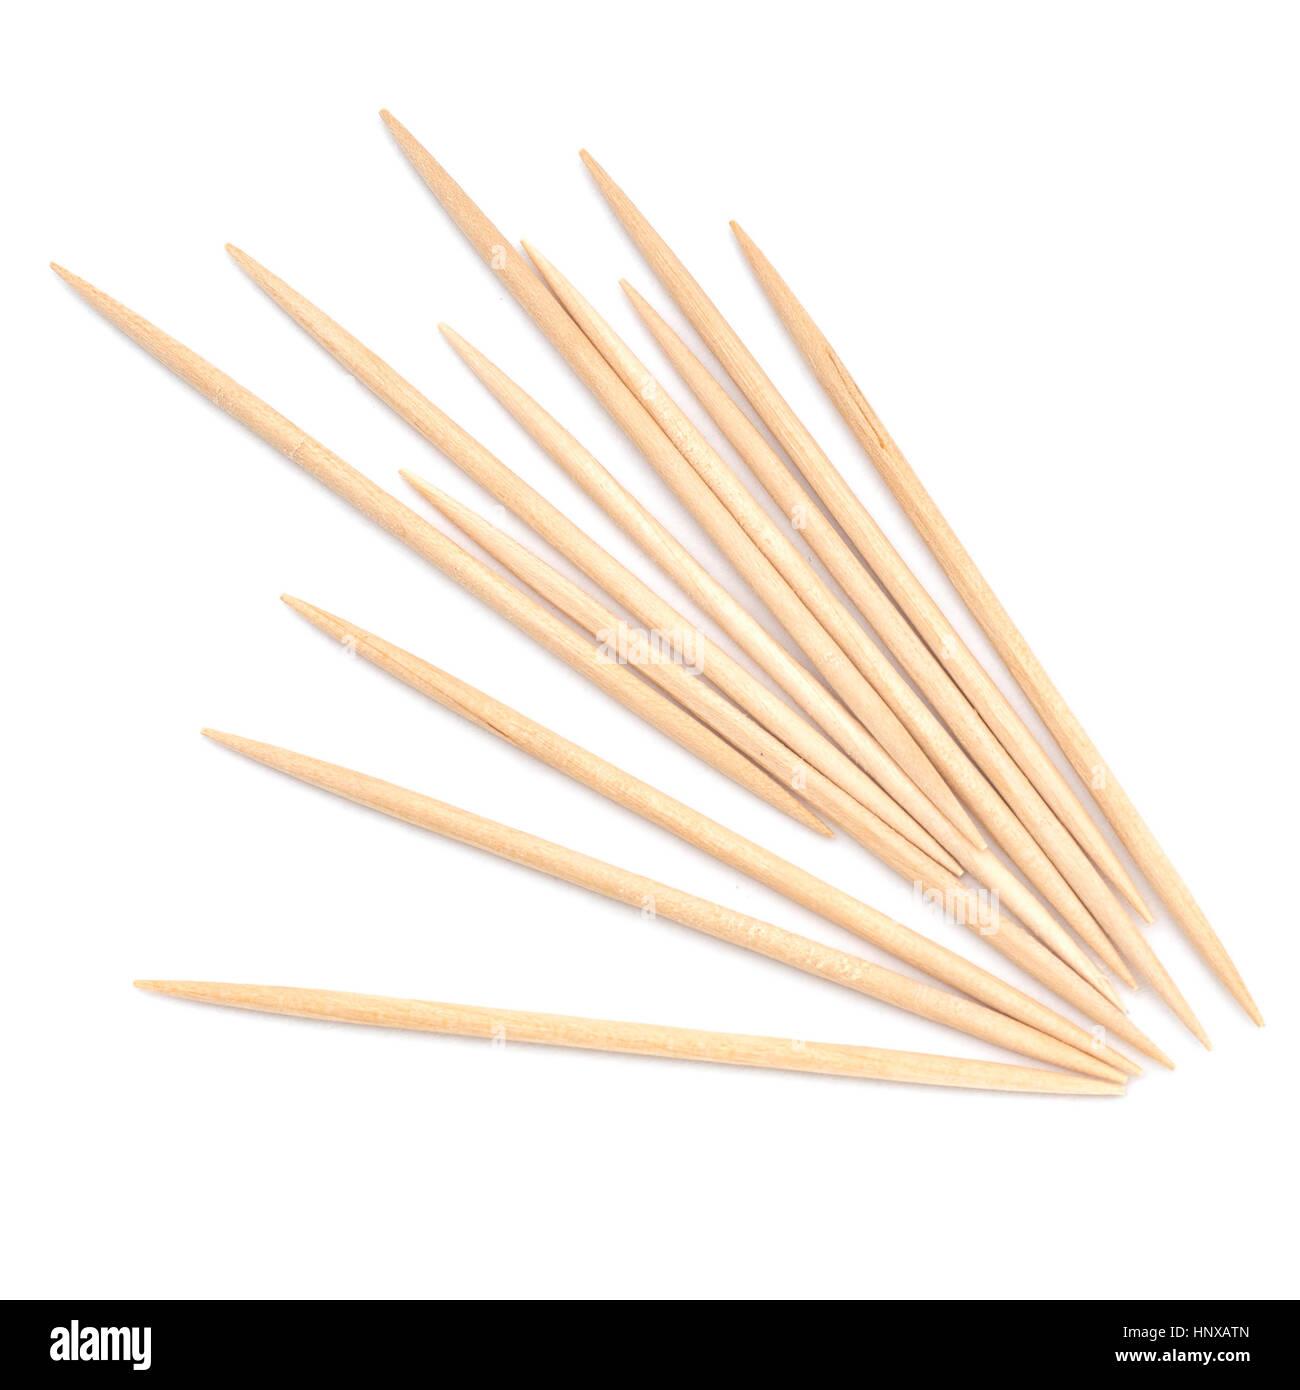 Toothpicks, cocktail sticks. On white. - Stock Image